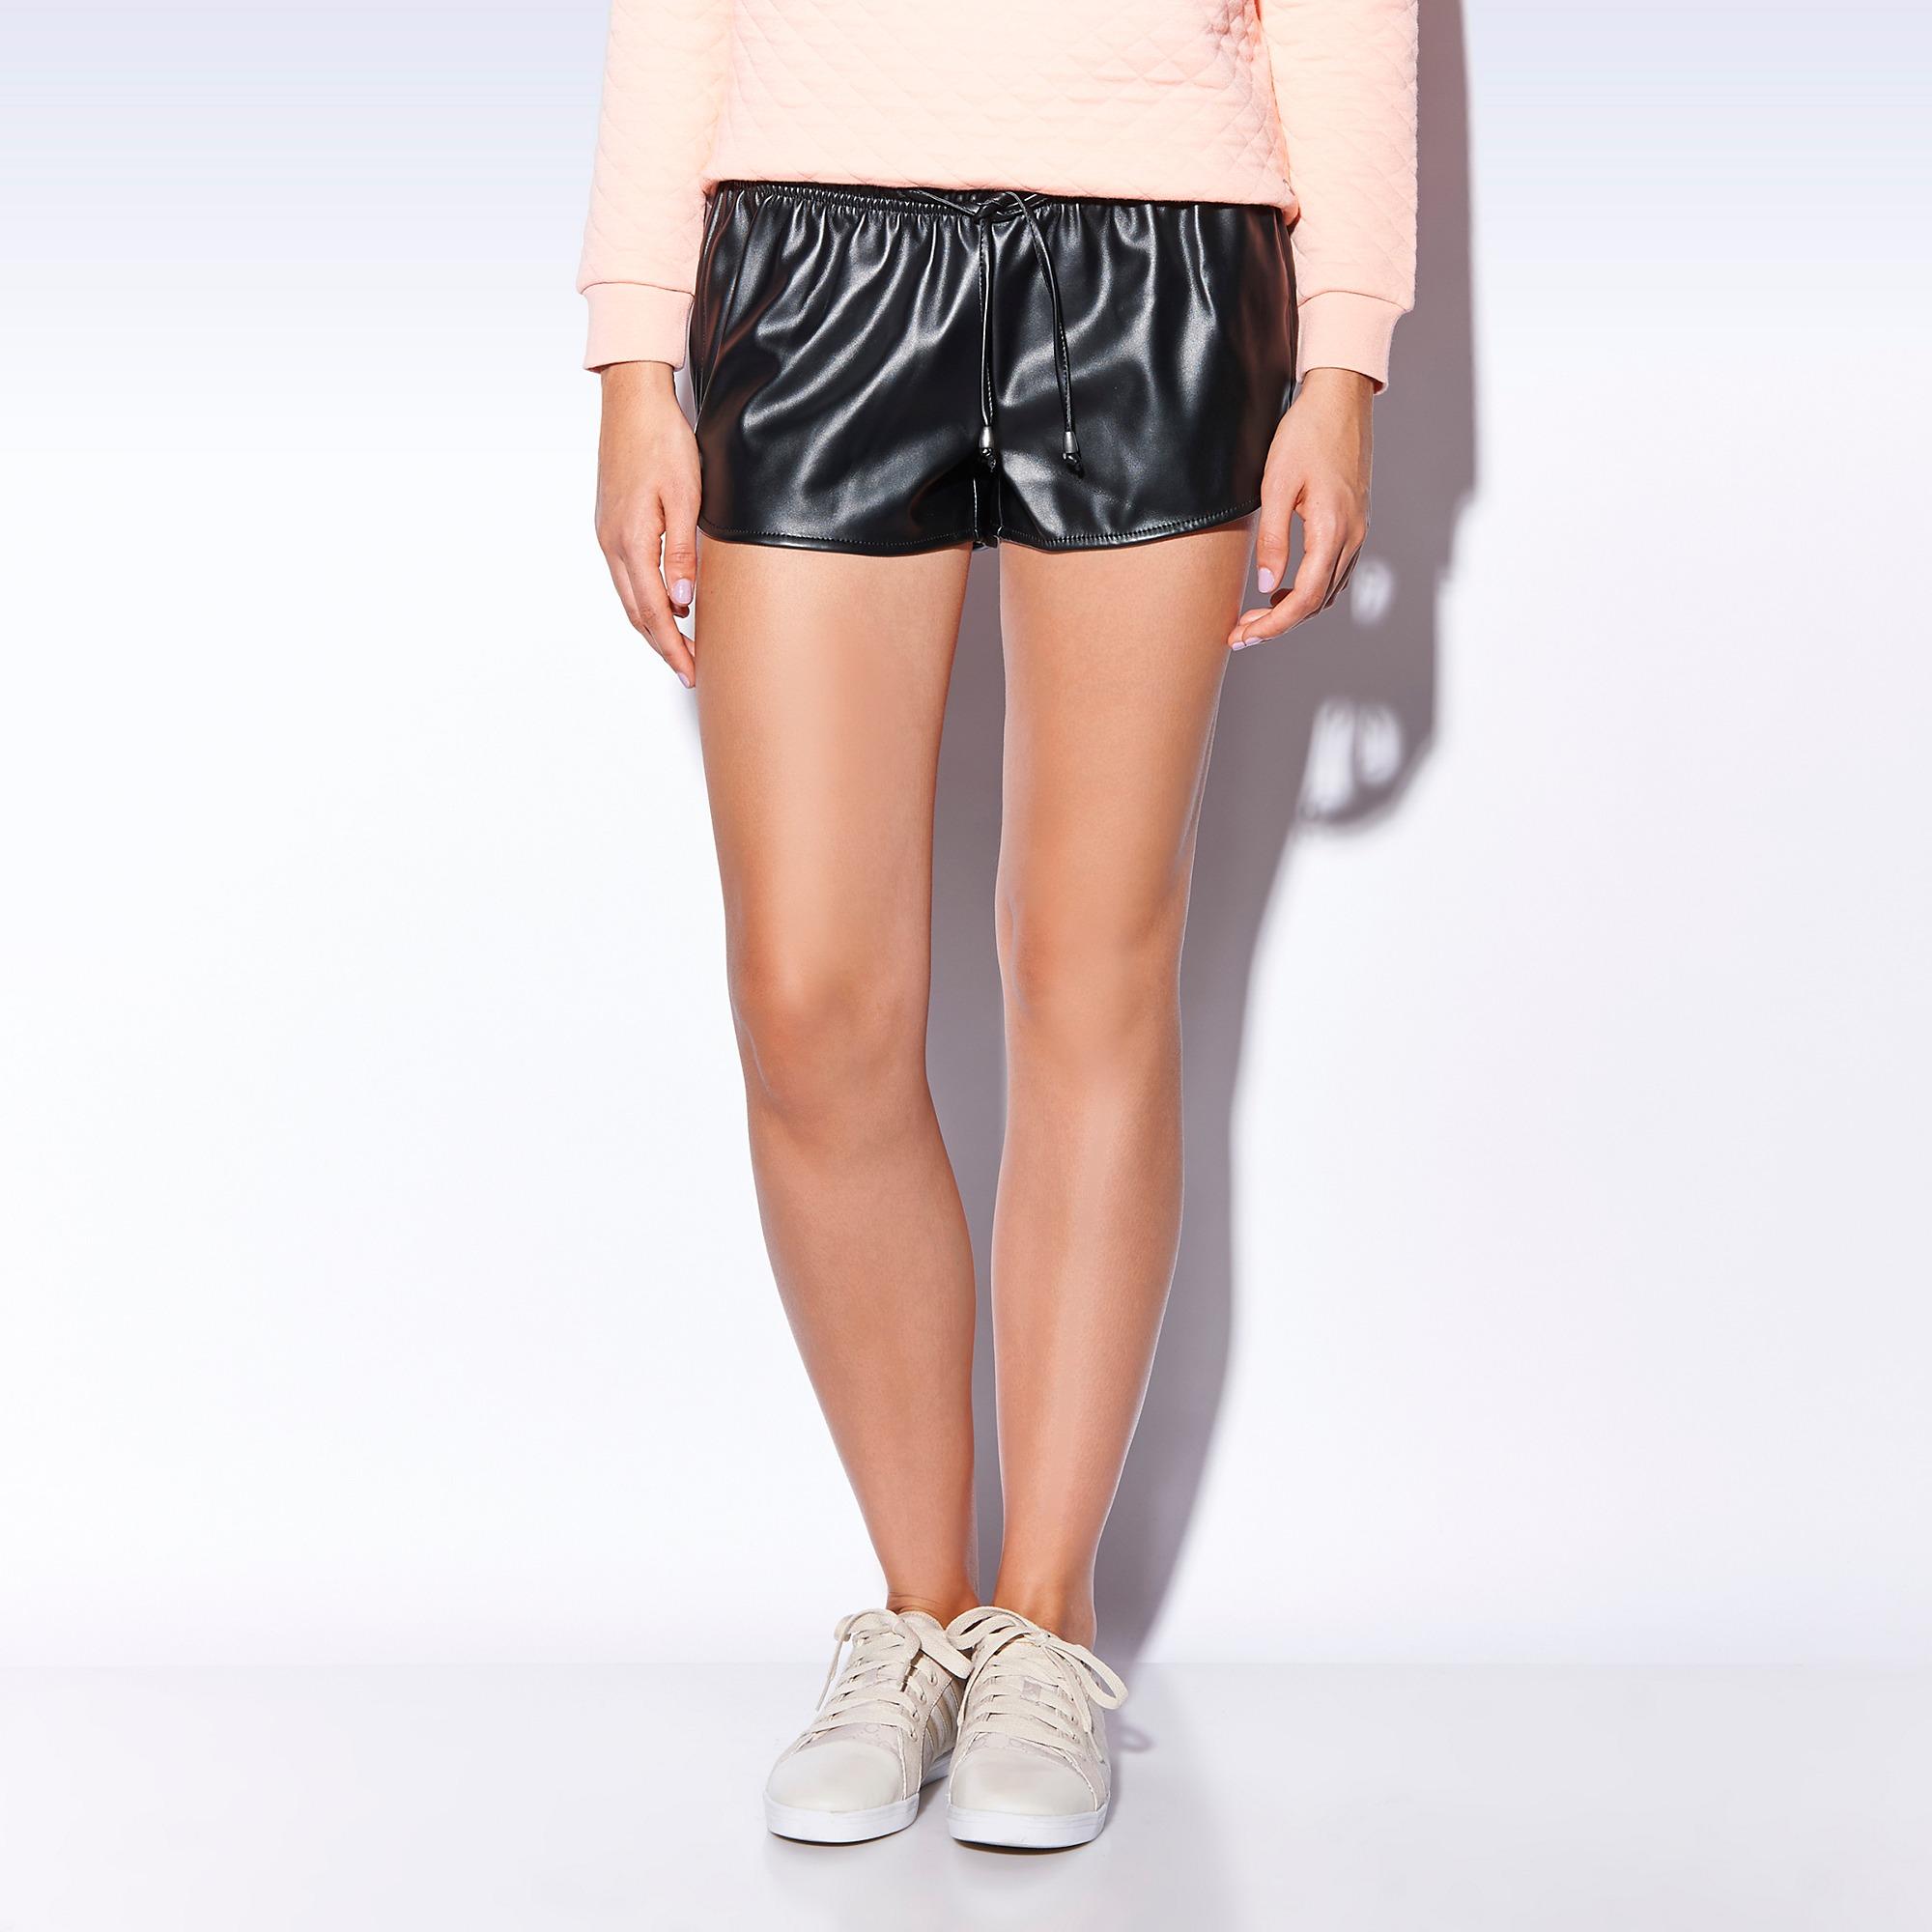 adidas Selena Gomez Runner Shorts | adidas US